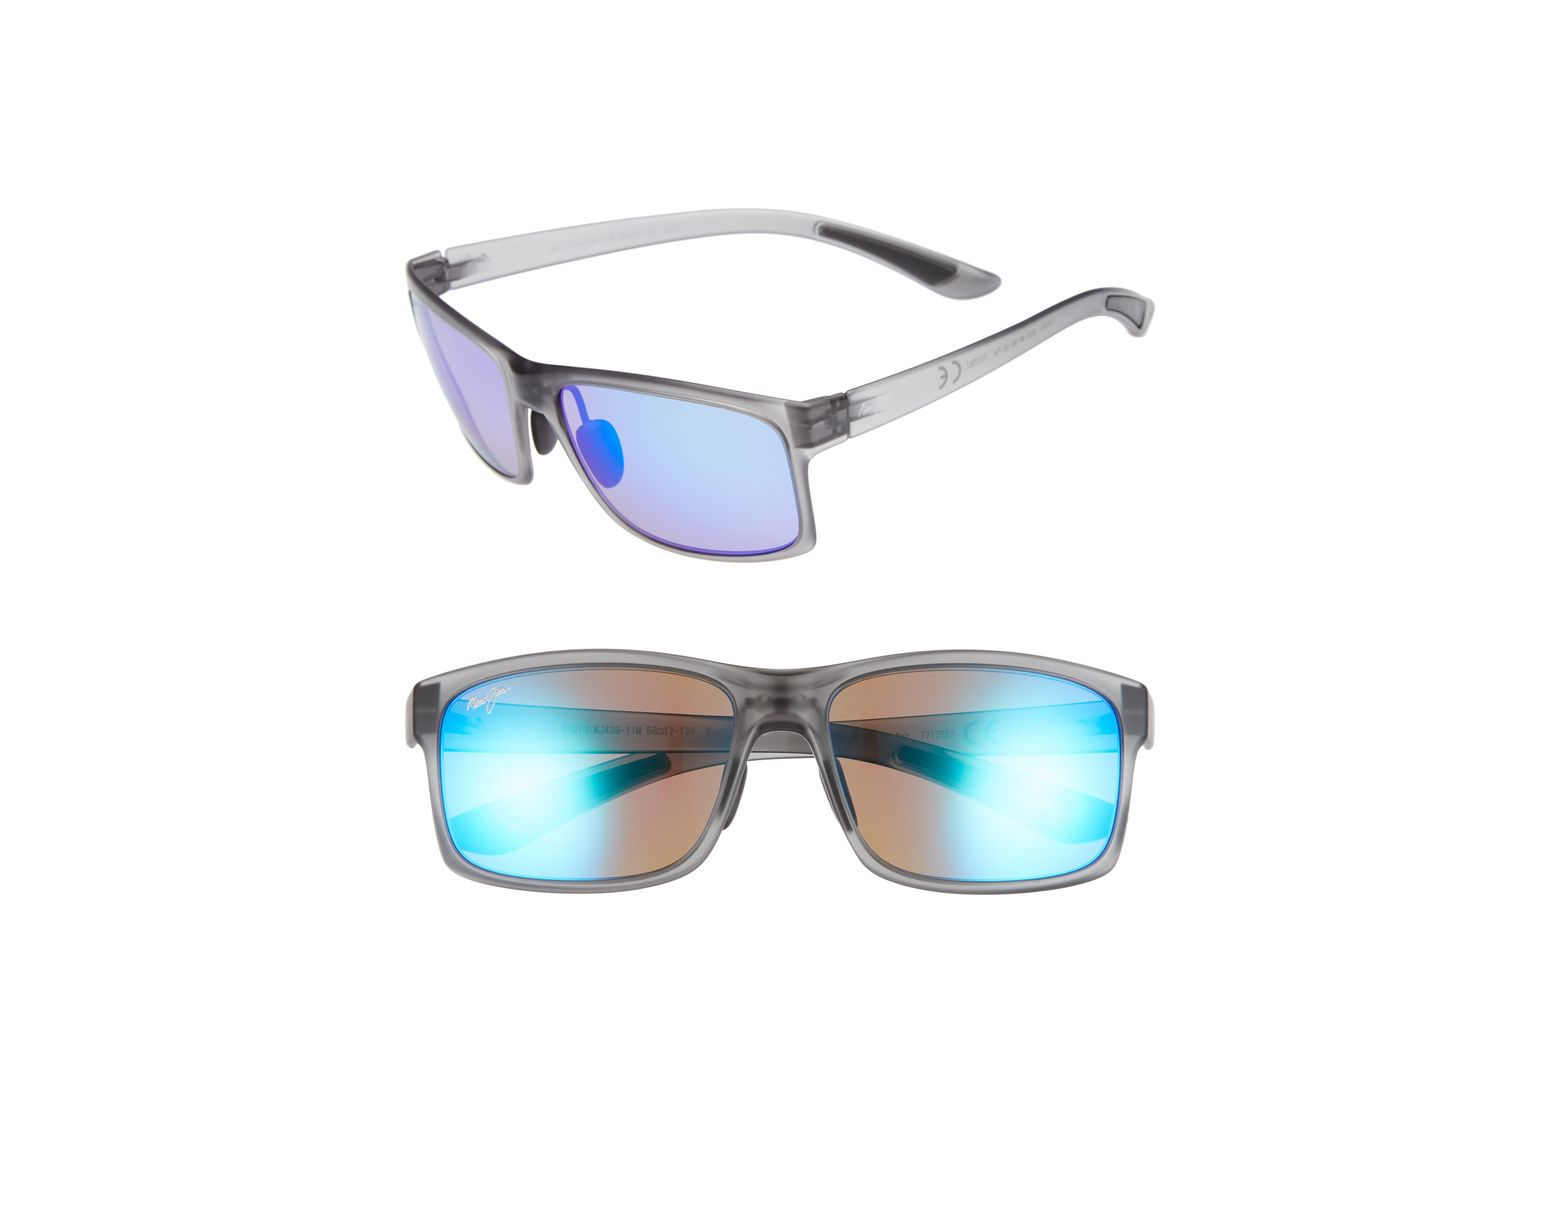 3c5f16774efe3 Maui Jim Pokowai Arch 58mm Polarized Sunglasses - Translucent Matte Grey   Blue in Gray for Men - Lyst